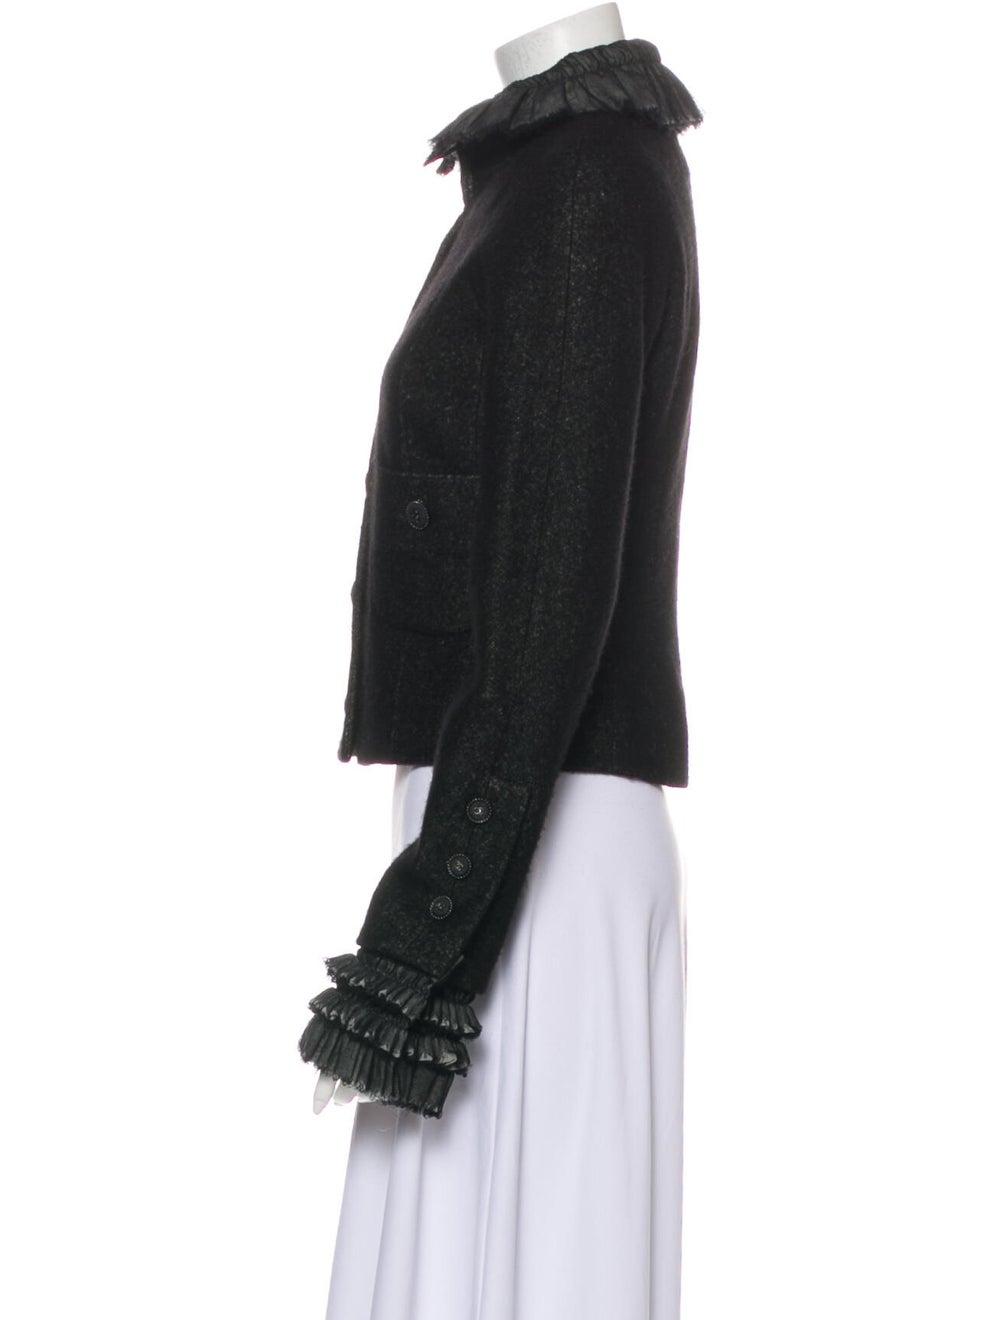 Chanel 2013 Linen Jacket Black - image 2